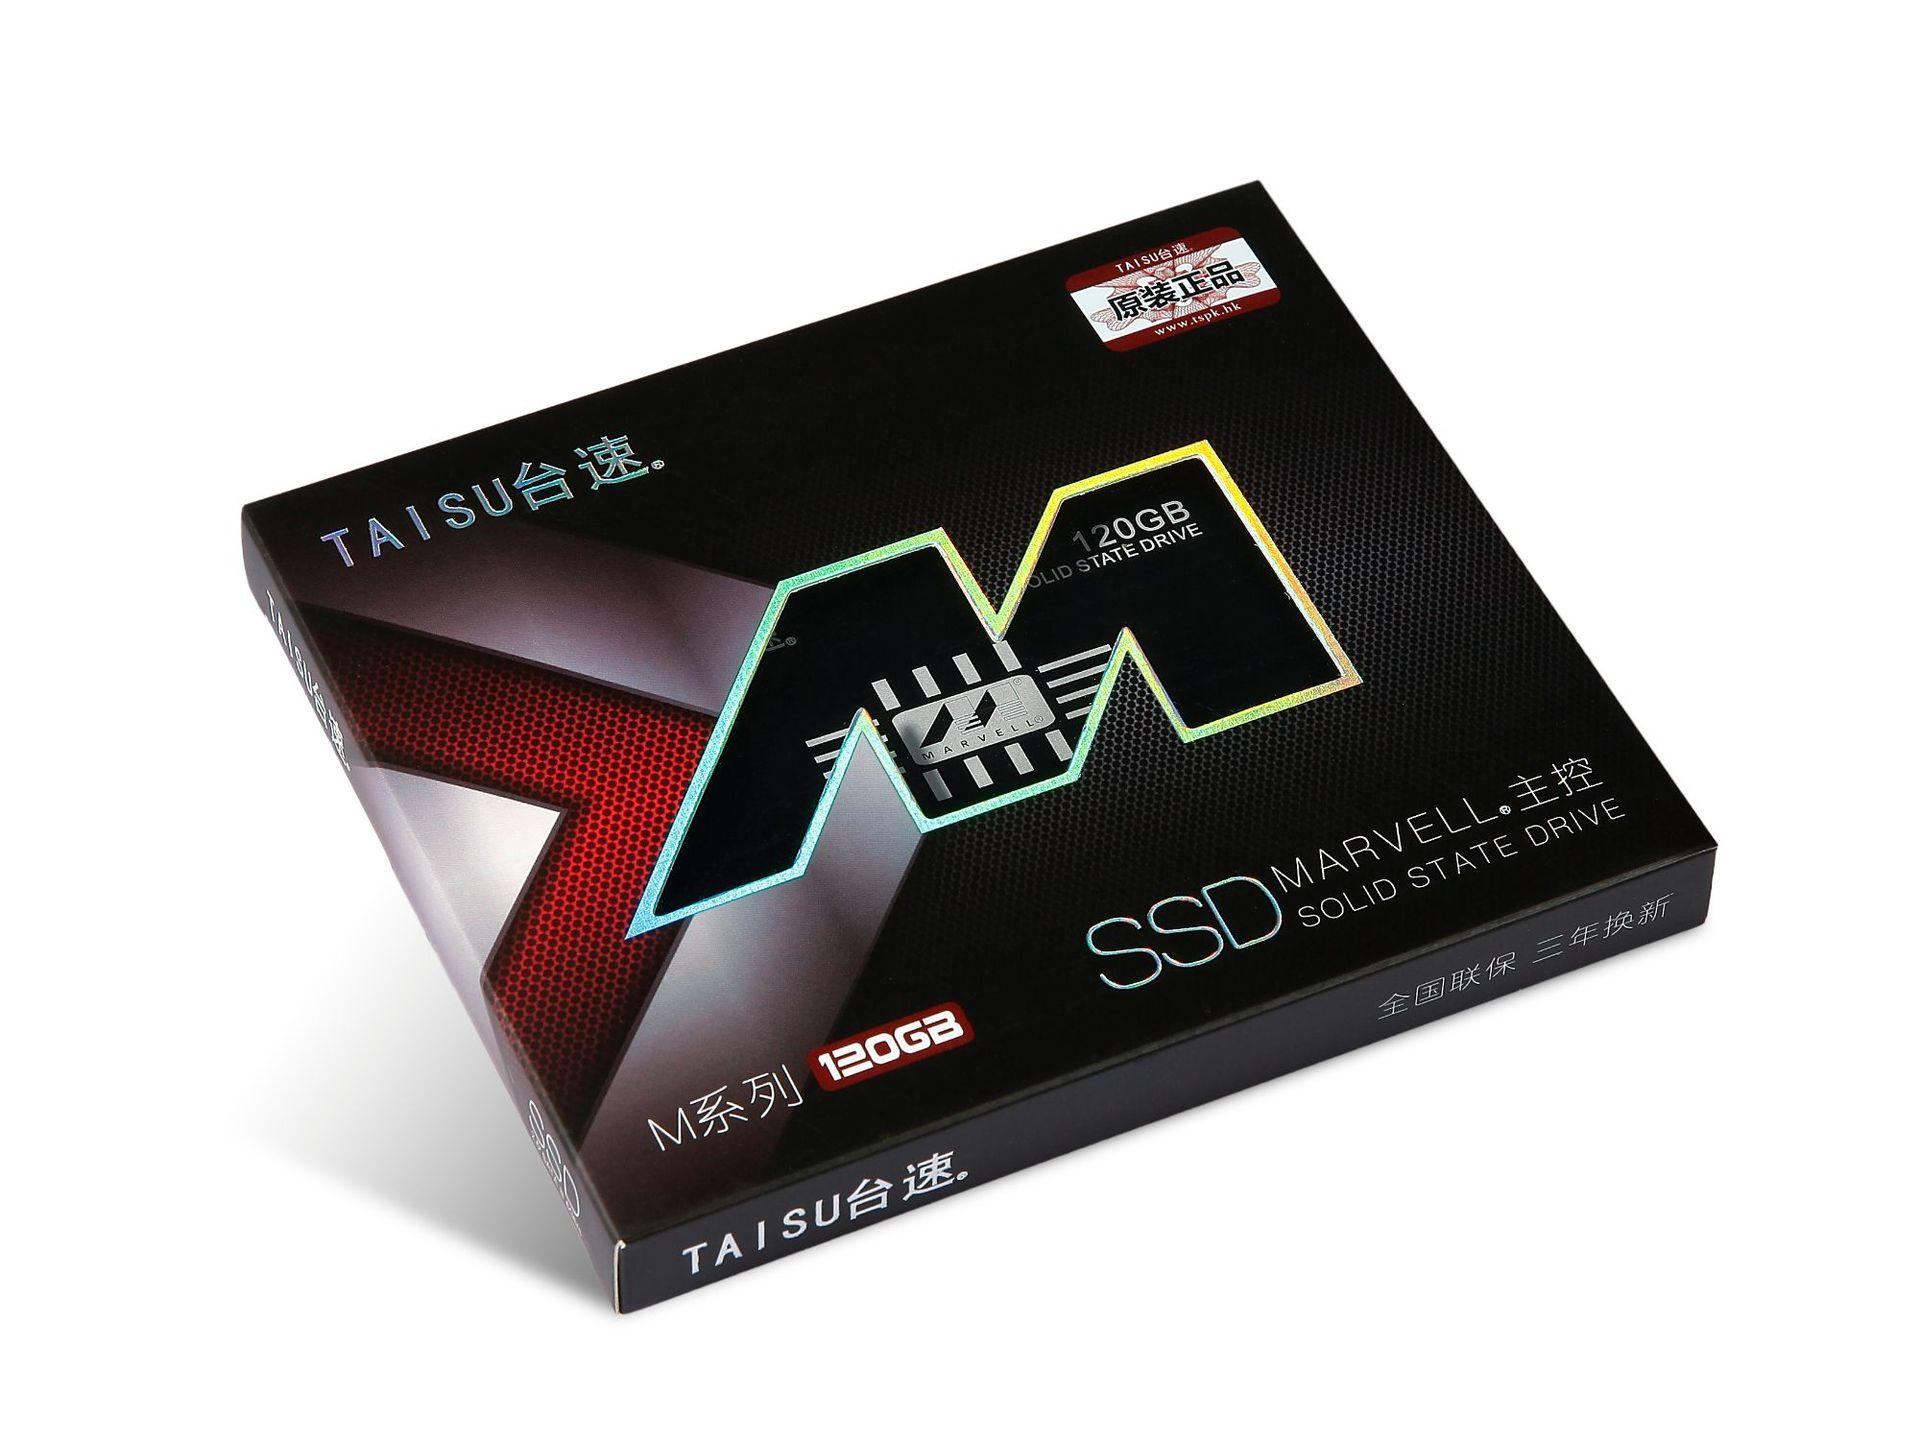 TAISU Ổ cứng SSD- marvell 60G -120G - 240 / MLC2.5